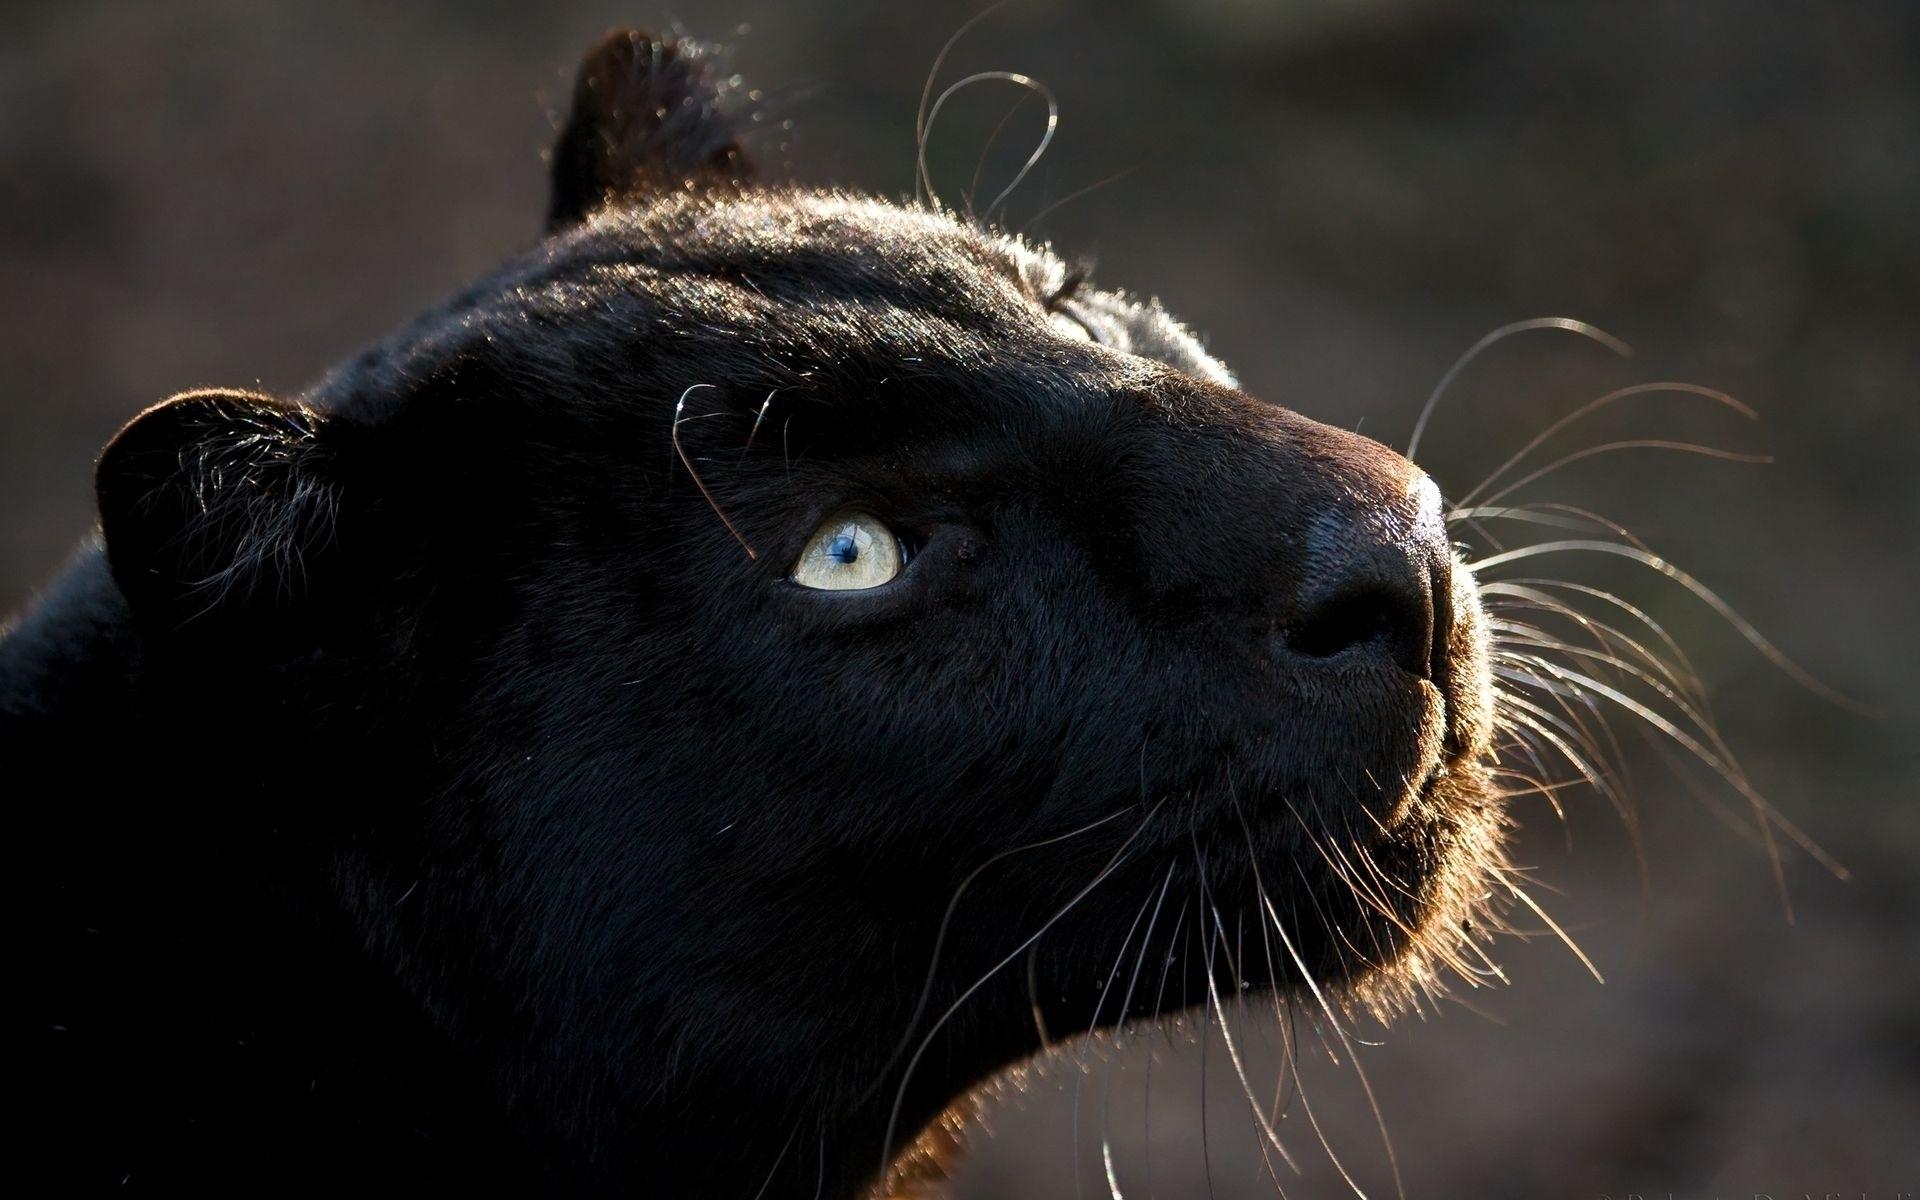 Download Black Jaguar Animal Wallpaper pictures in high 1920x1200